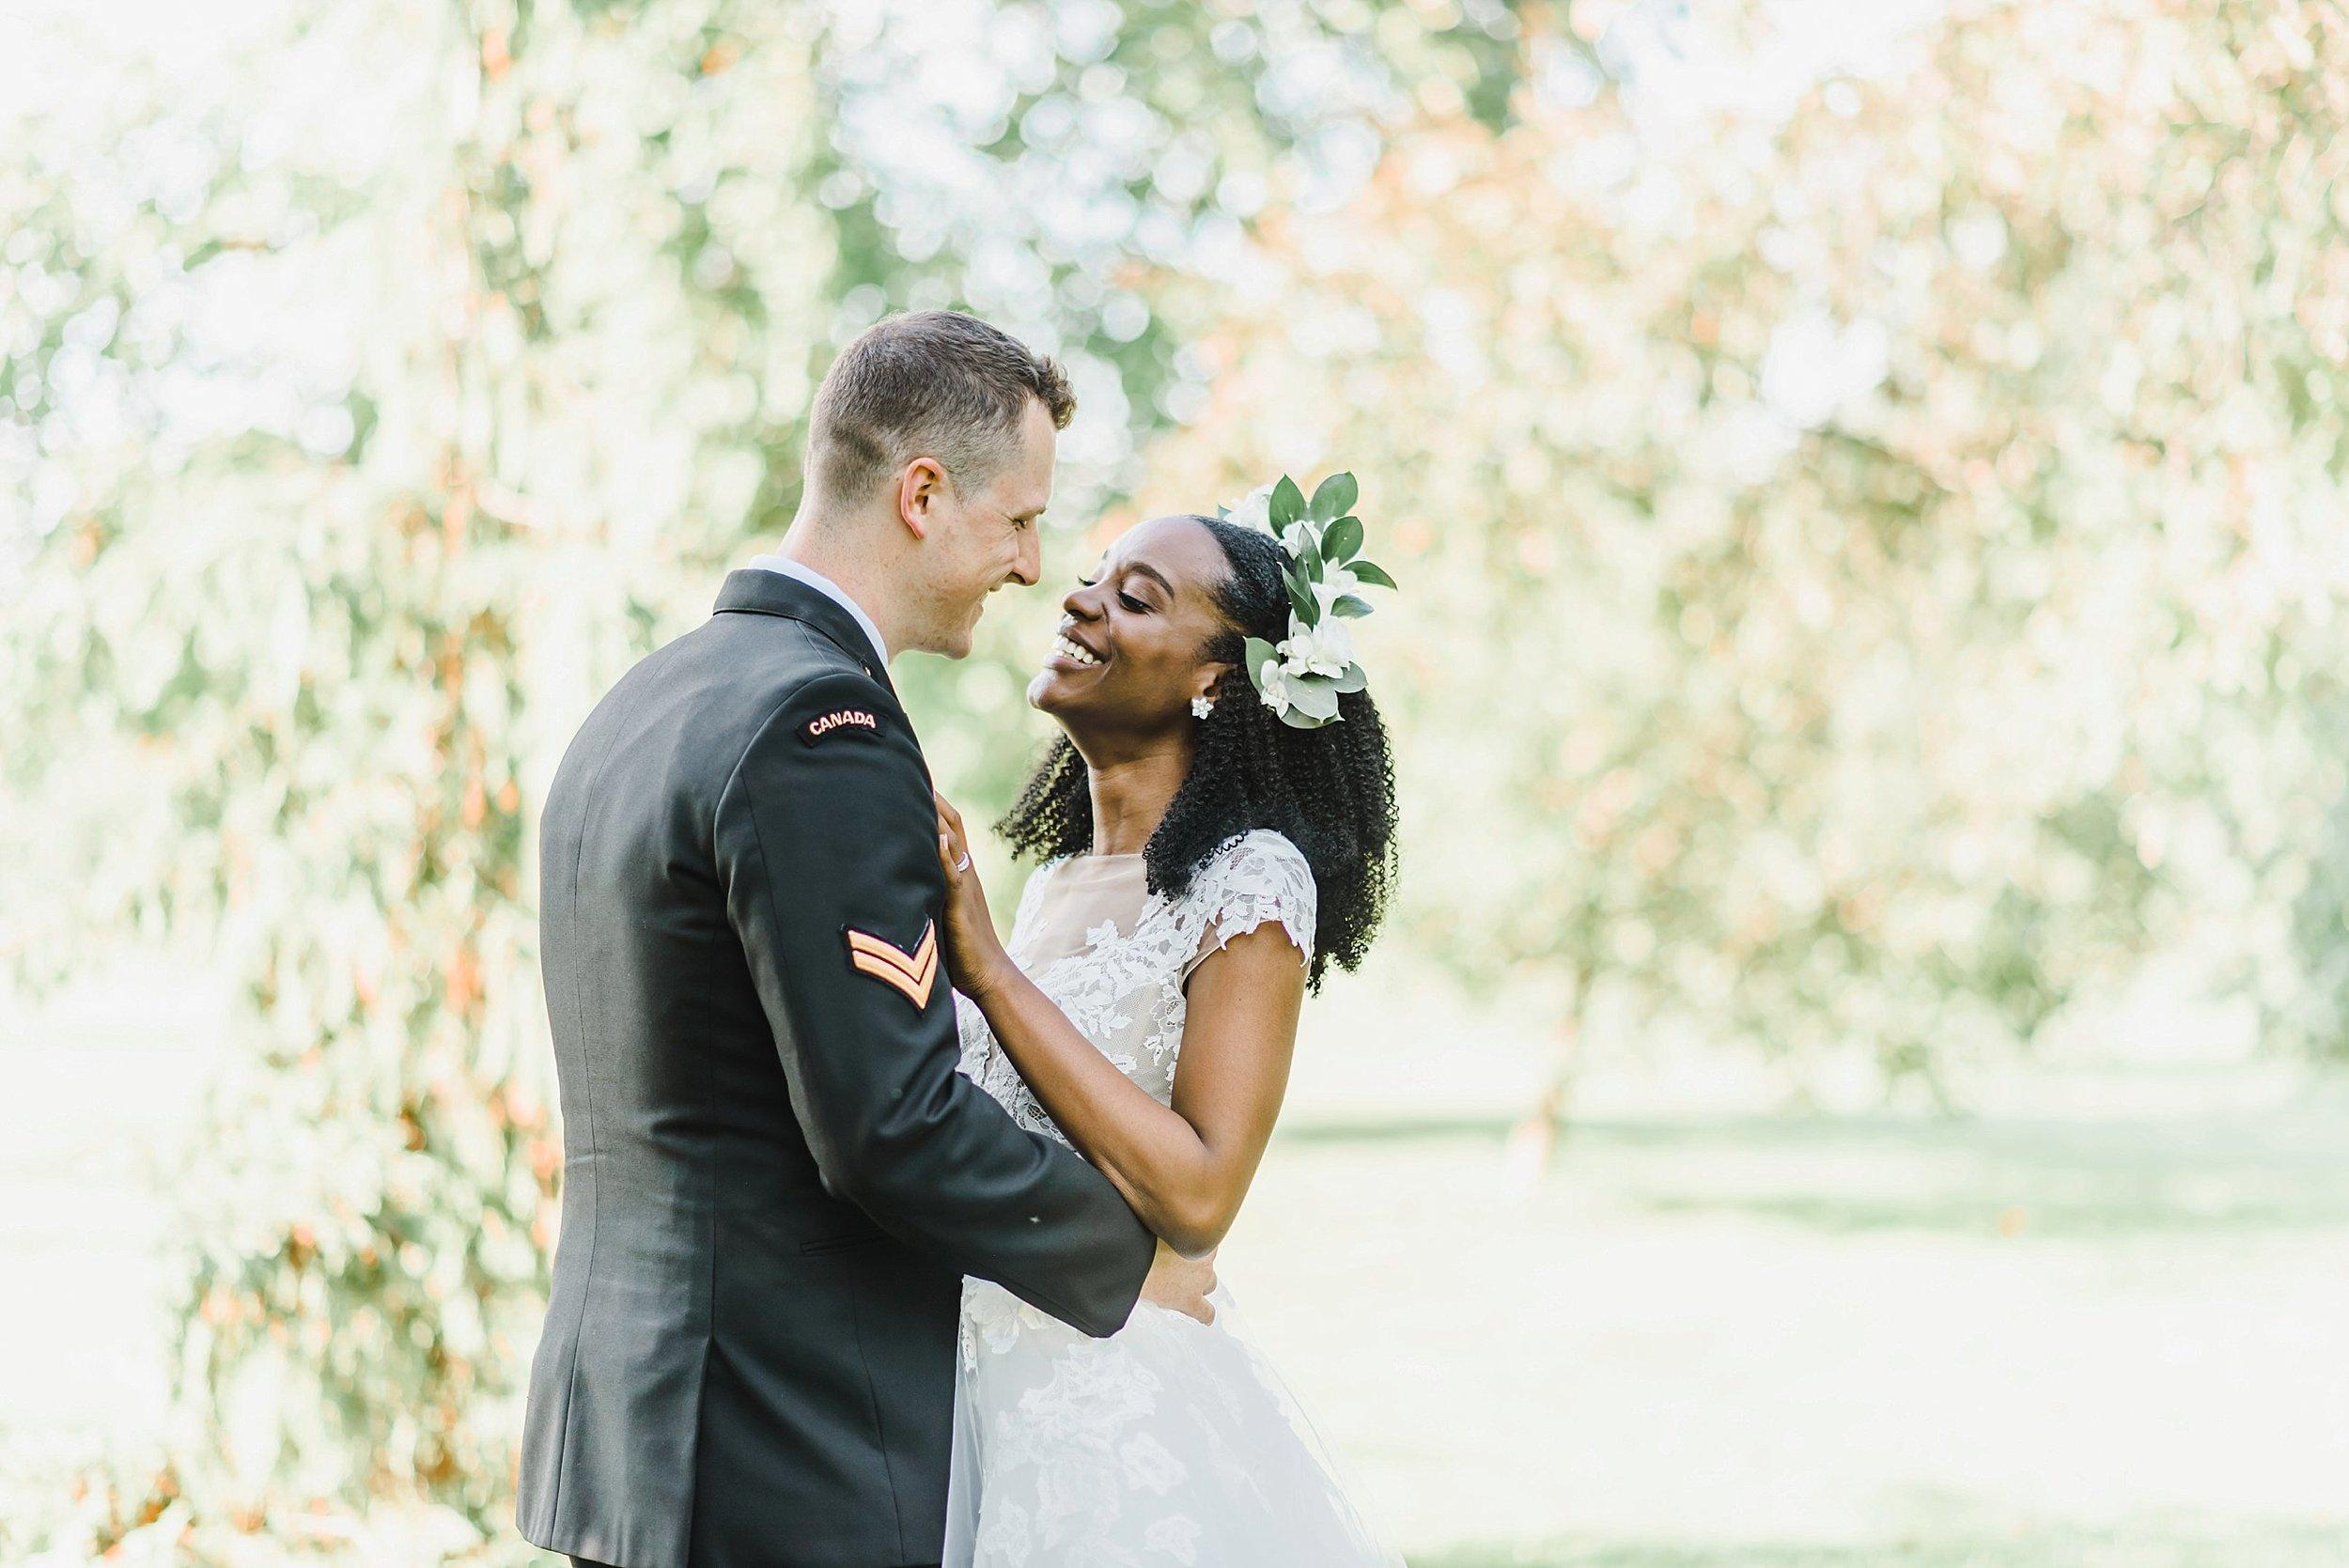 light airy indie fine art ottawa wedding photographer | Ali and Batoul Photography_0996.jpg